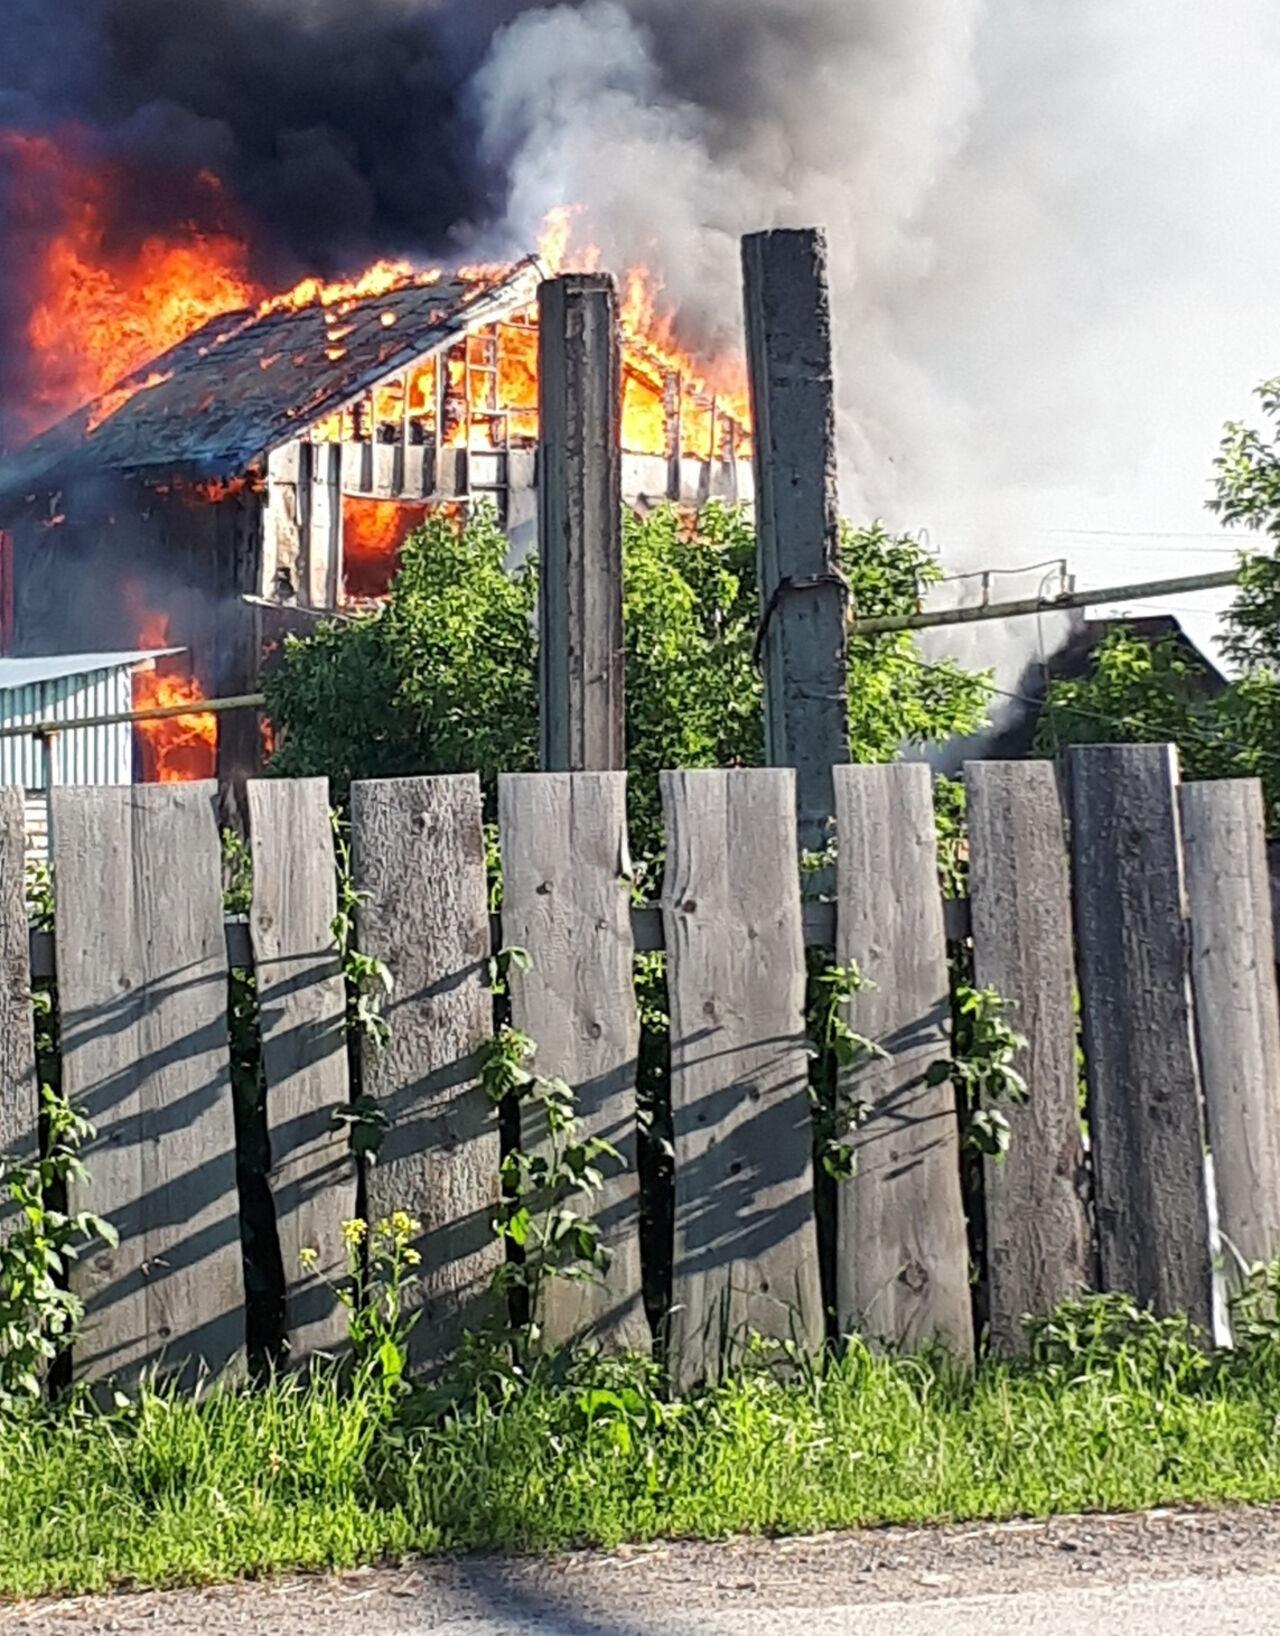 Вгоревшем наМеталлплощадке доме умер пенсионер